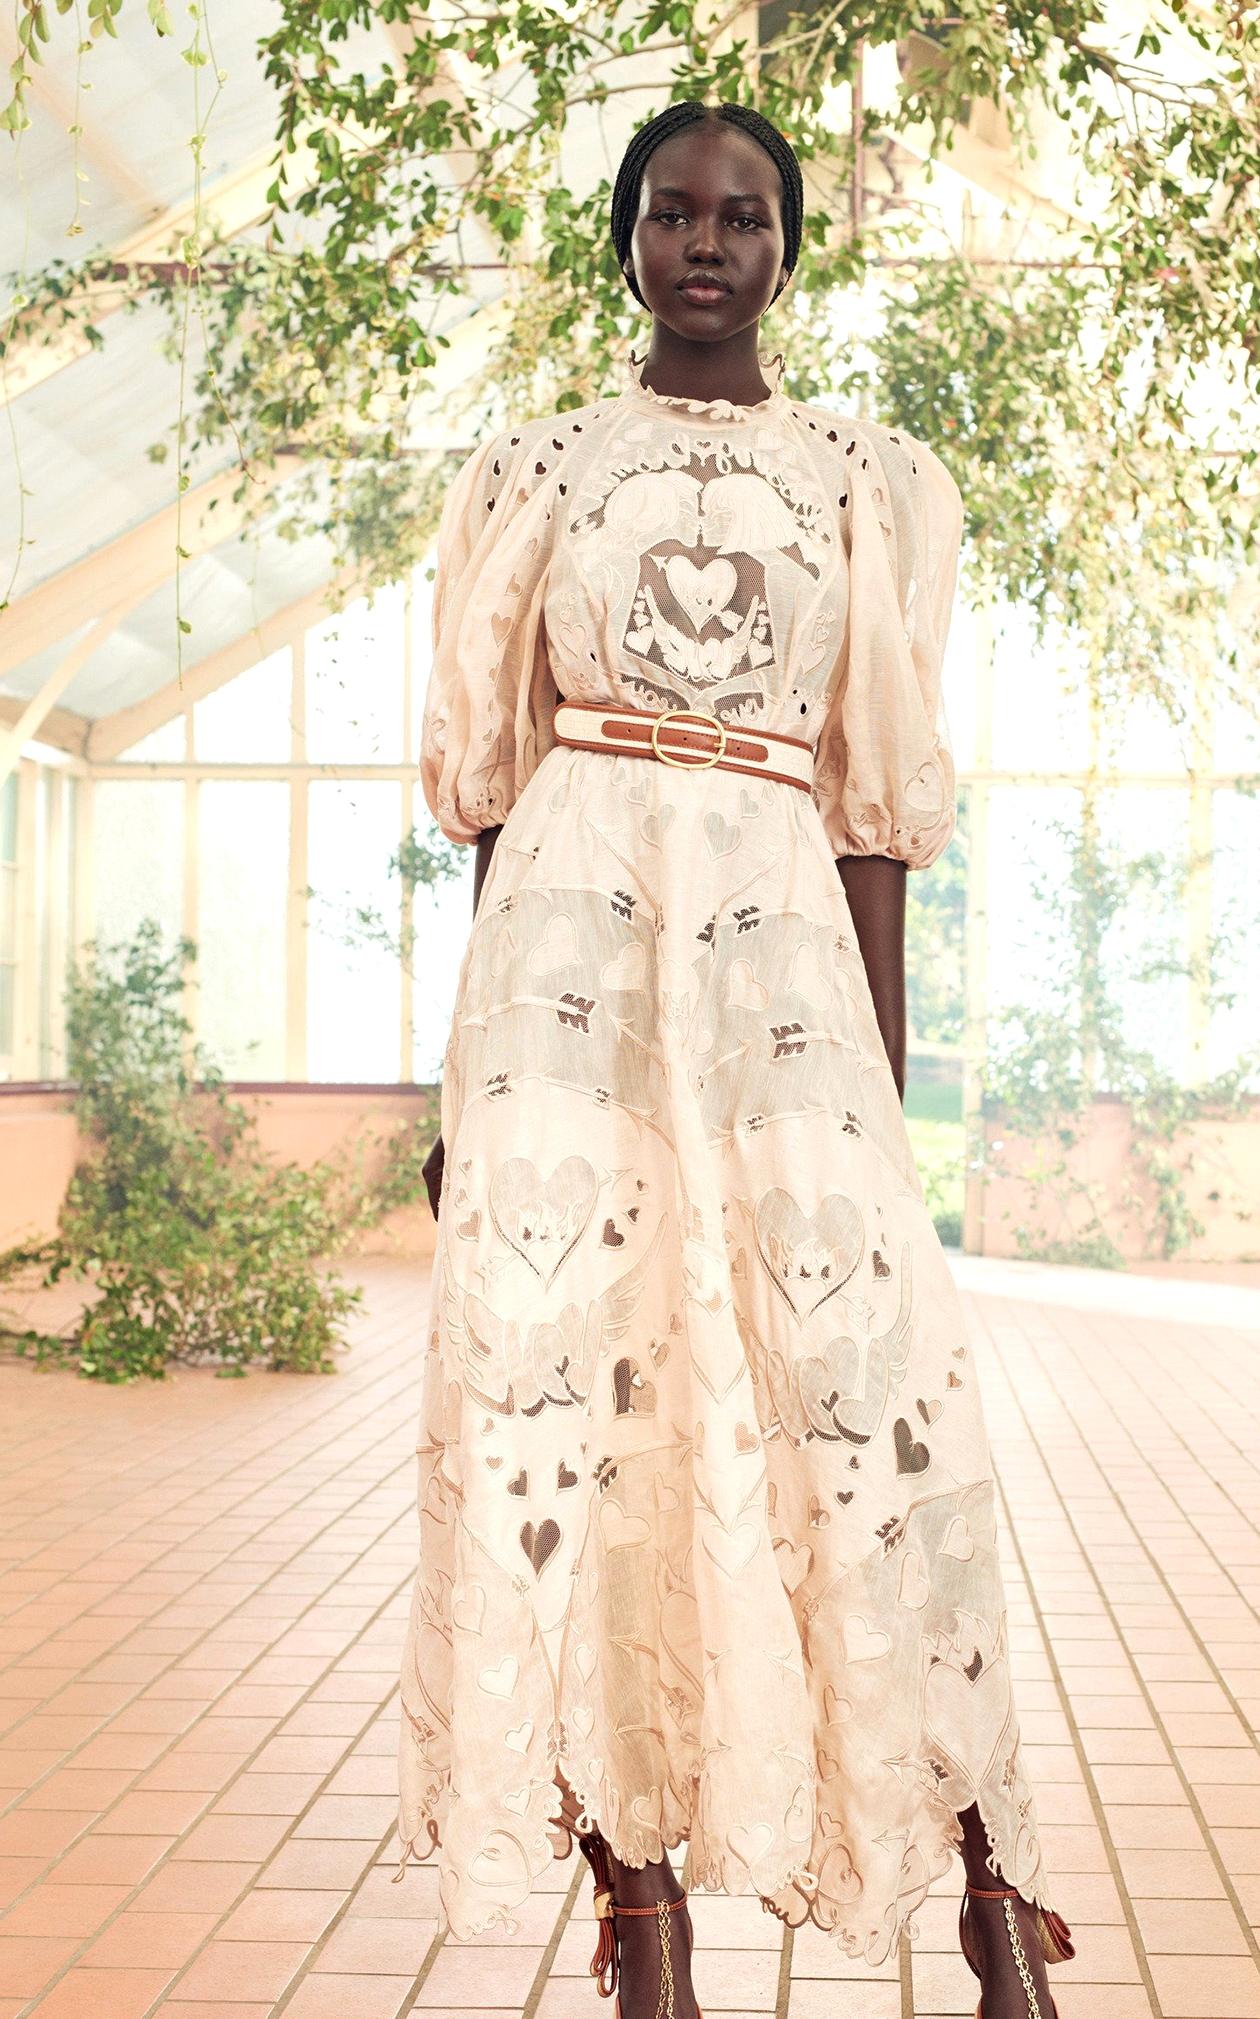 Pink Regencycore Dress